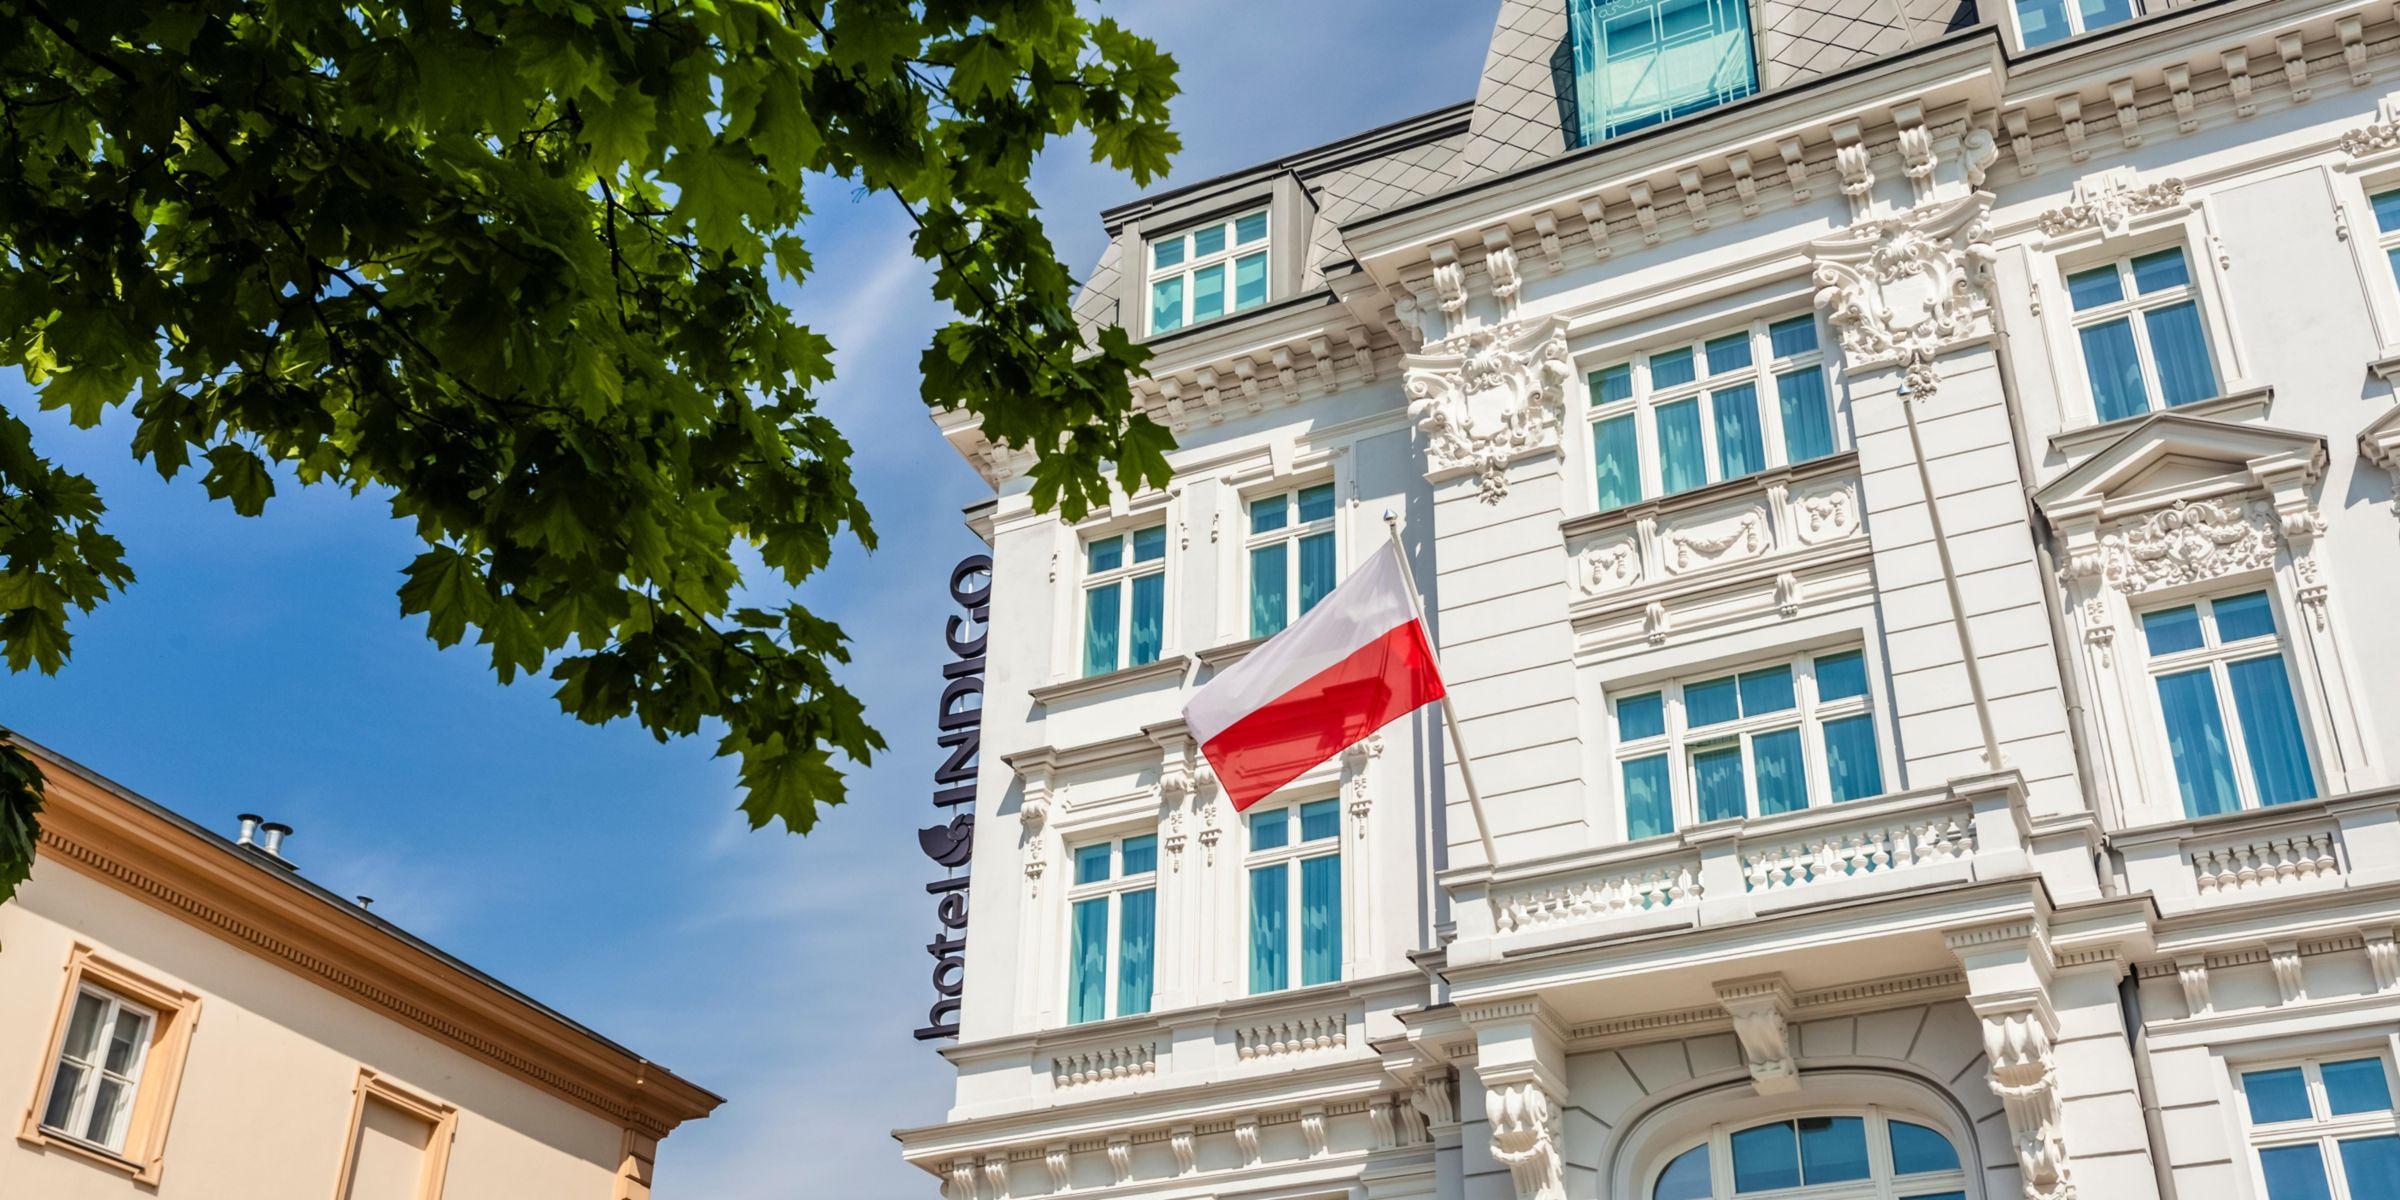 Boutique Hotel Warsaw: Hotel Indigo Warsaw - Nowy Swiat